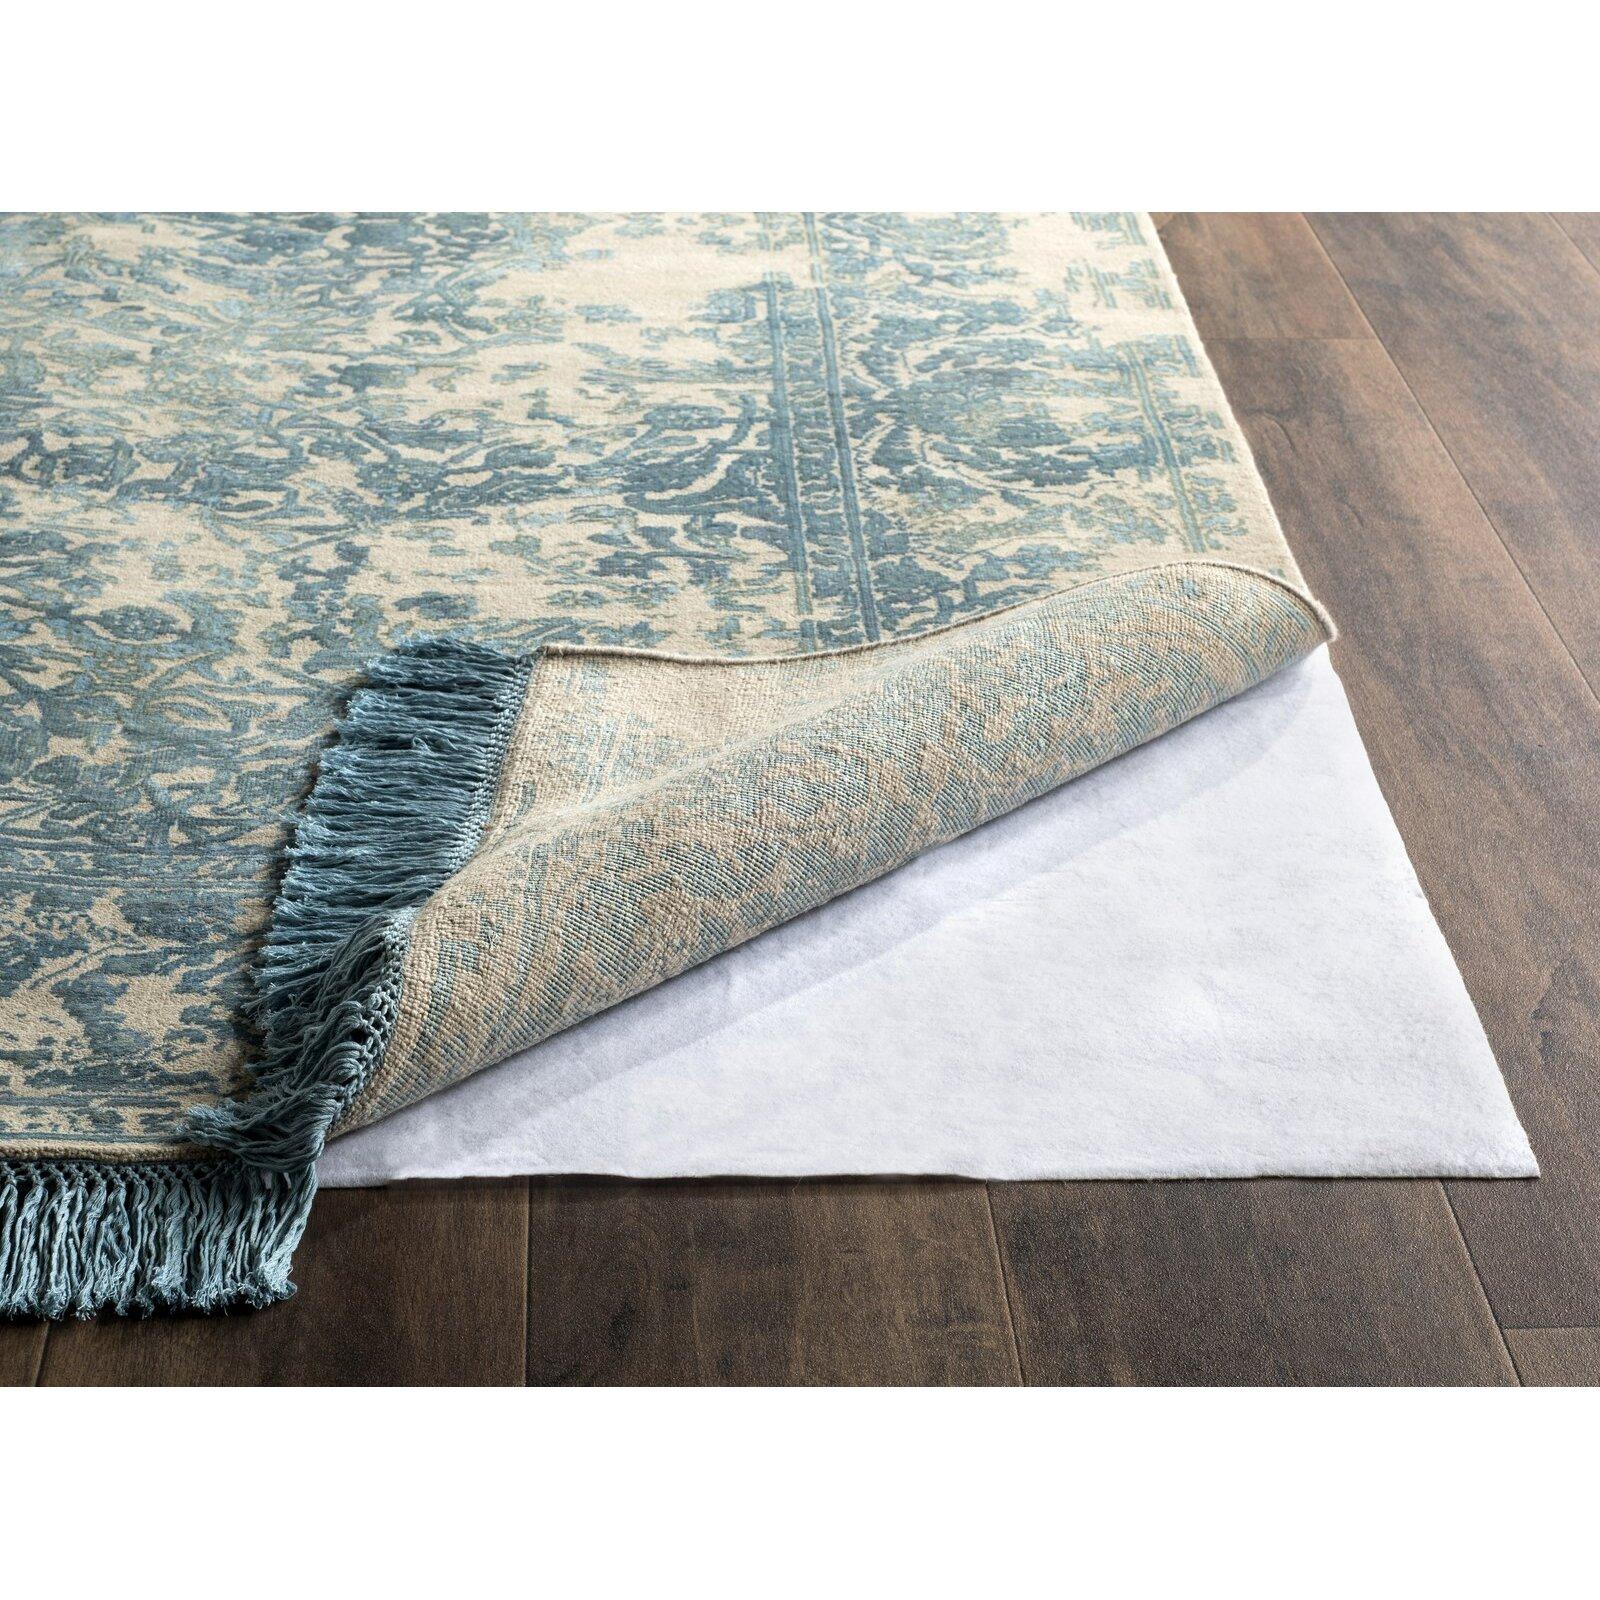 Removing Carpet Backing From Concrete Floor Vidalondon